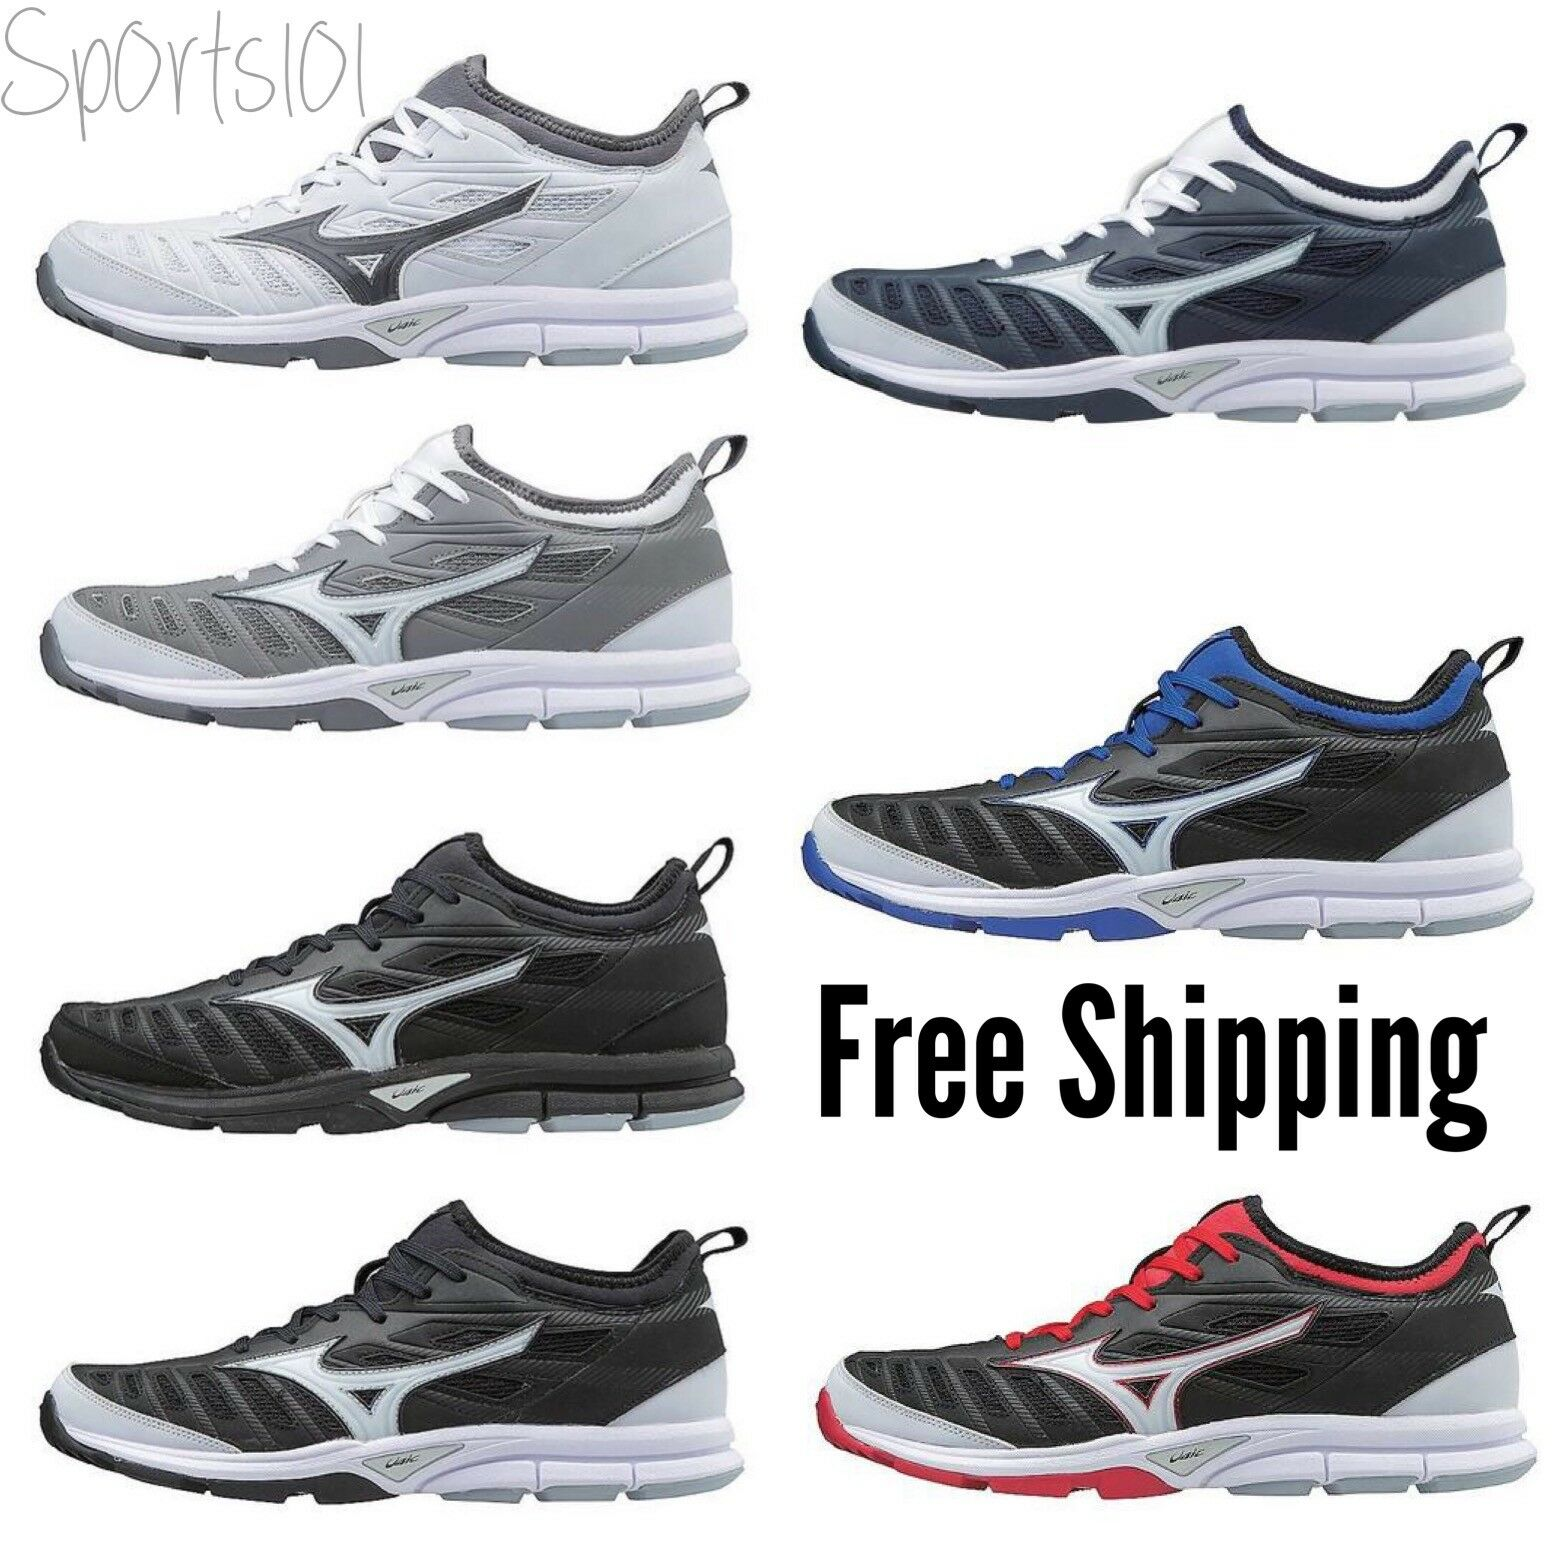 Mizuno Adult Players Trainer 2 Low Baseball Softball shoes 320549